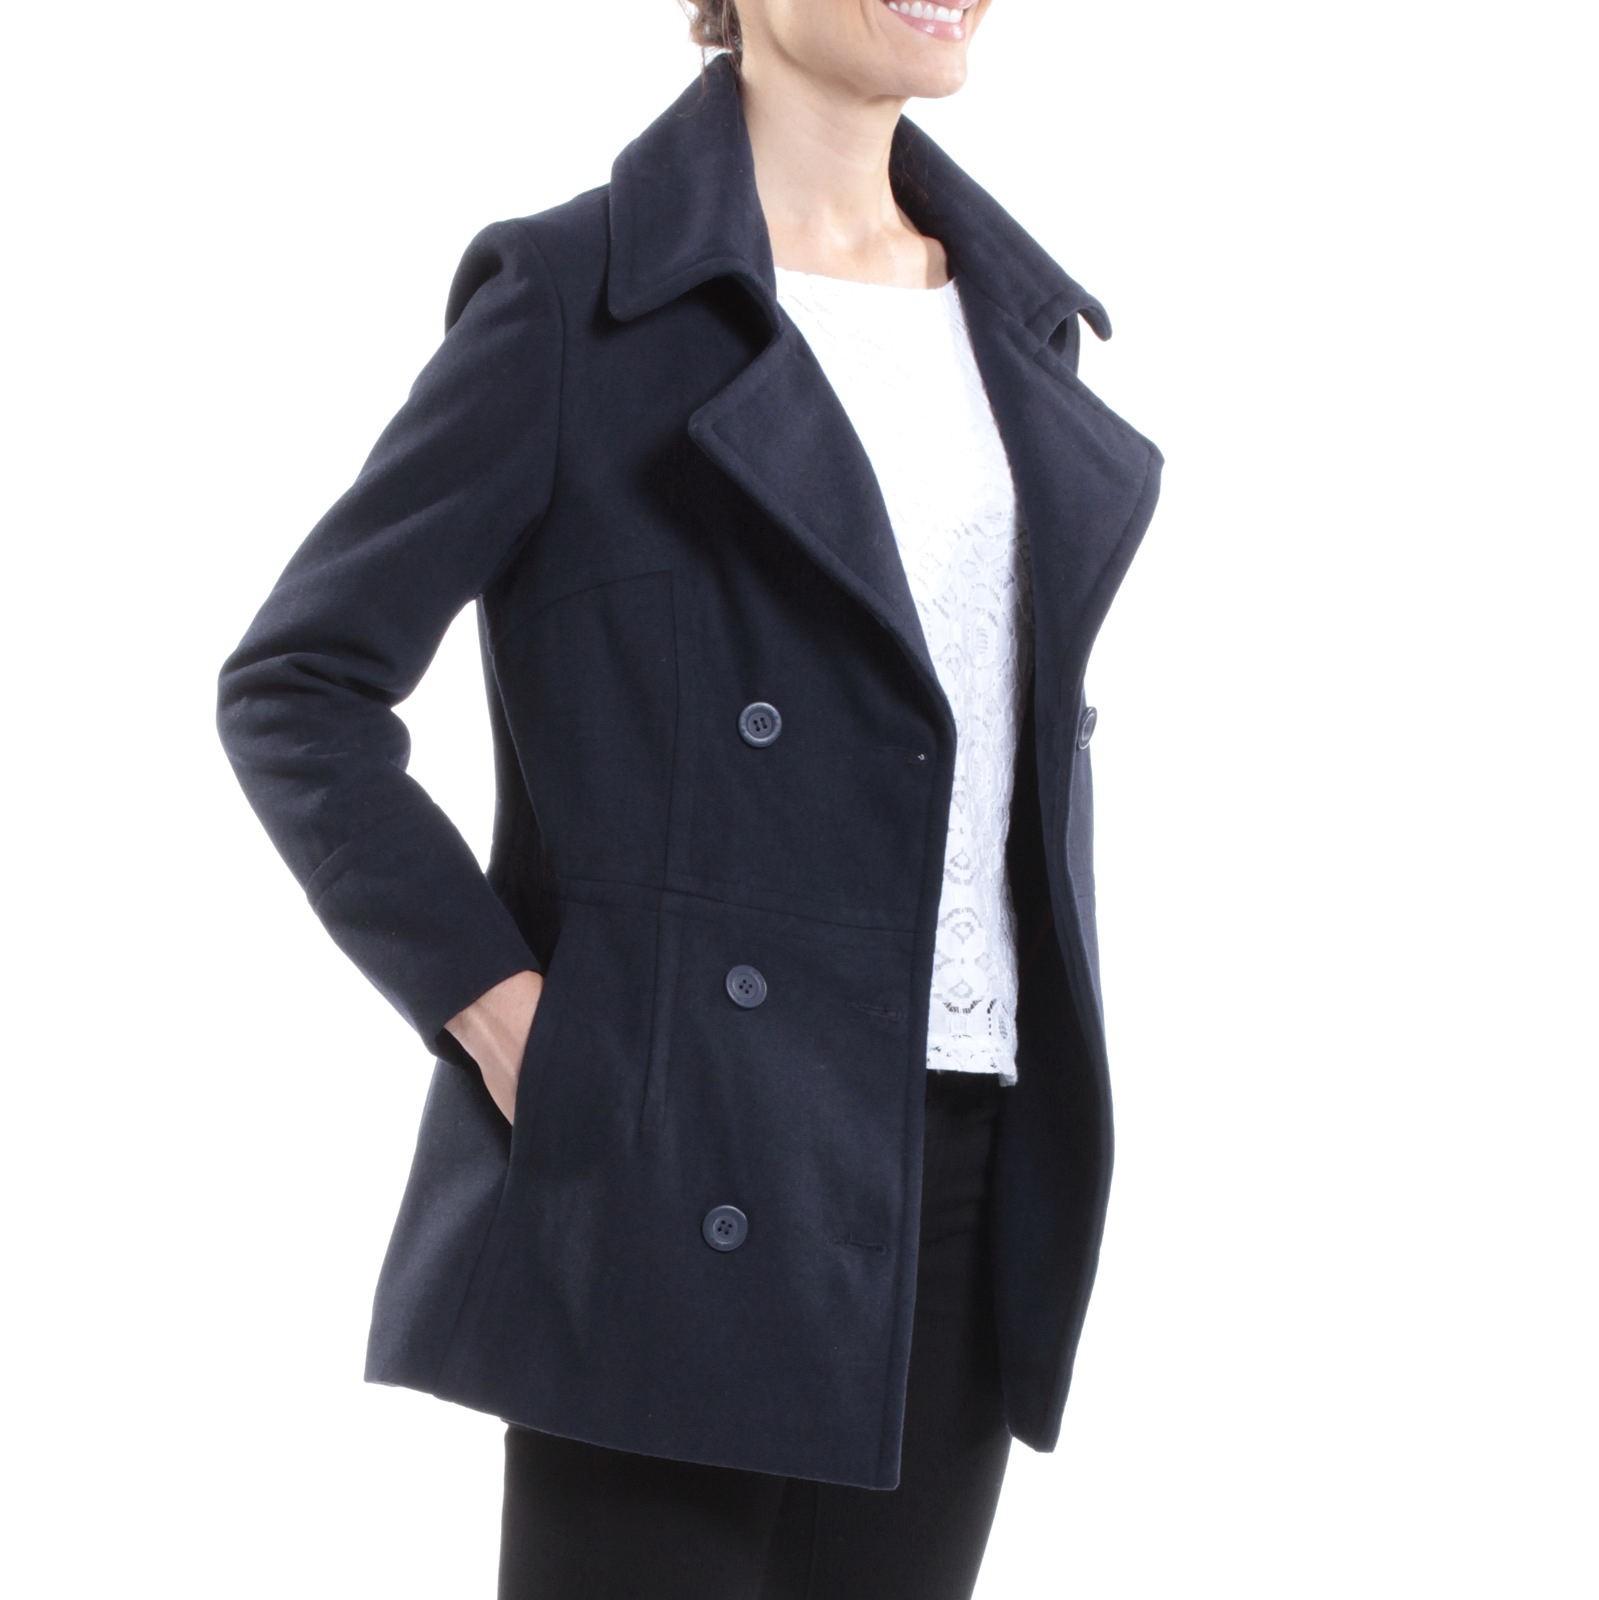 Alpine-Swiss-Emma-Womens-Peacoat-Jacket-Wool-Blazer-Double-Breasted-Overcoat-New thumbnail 54